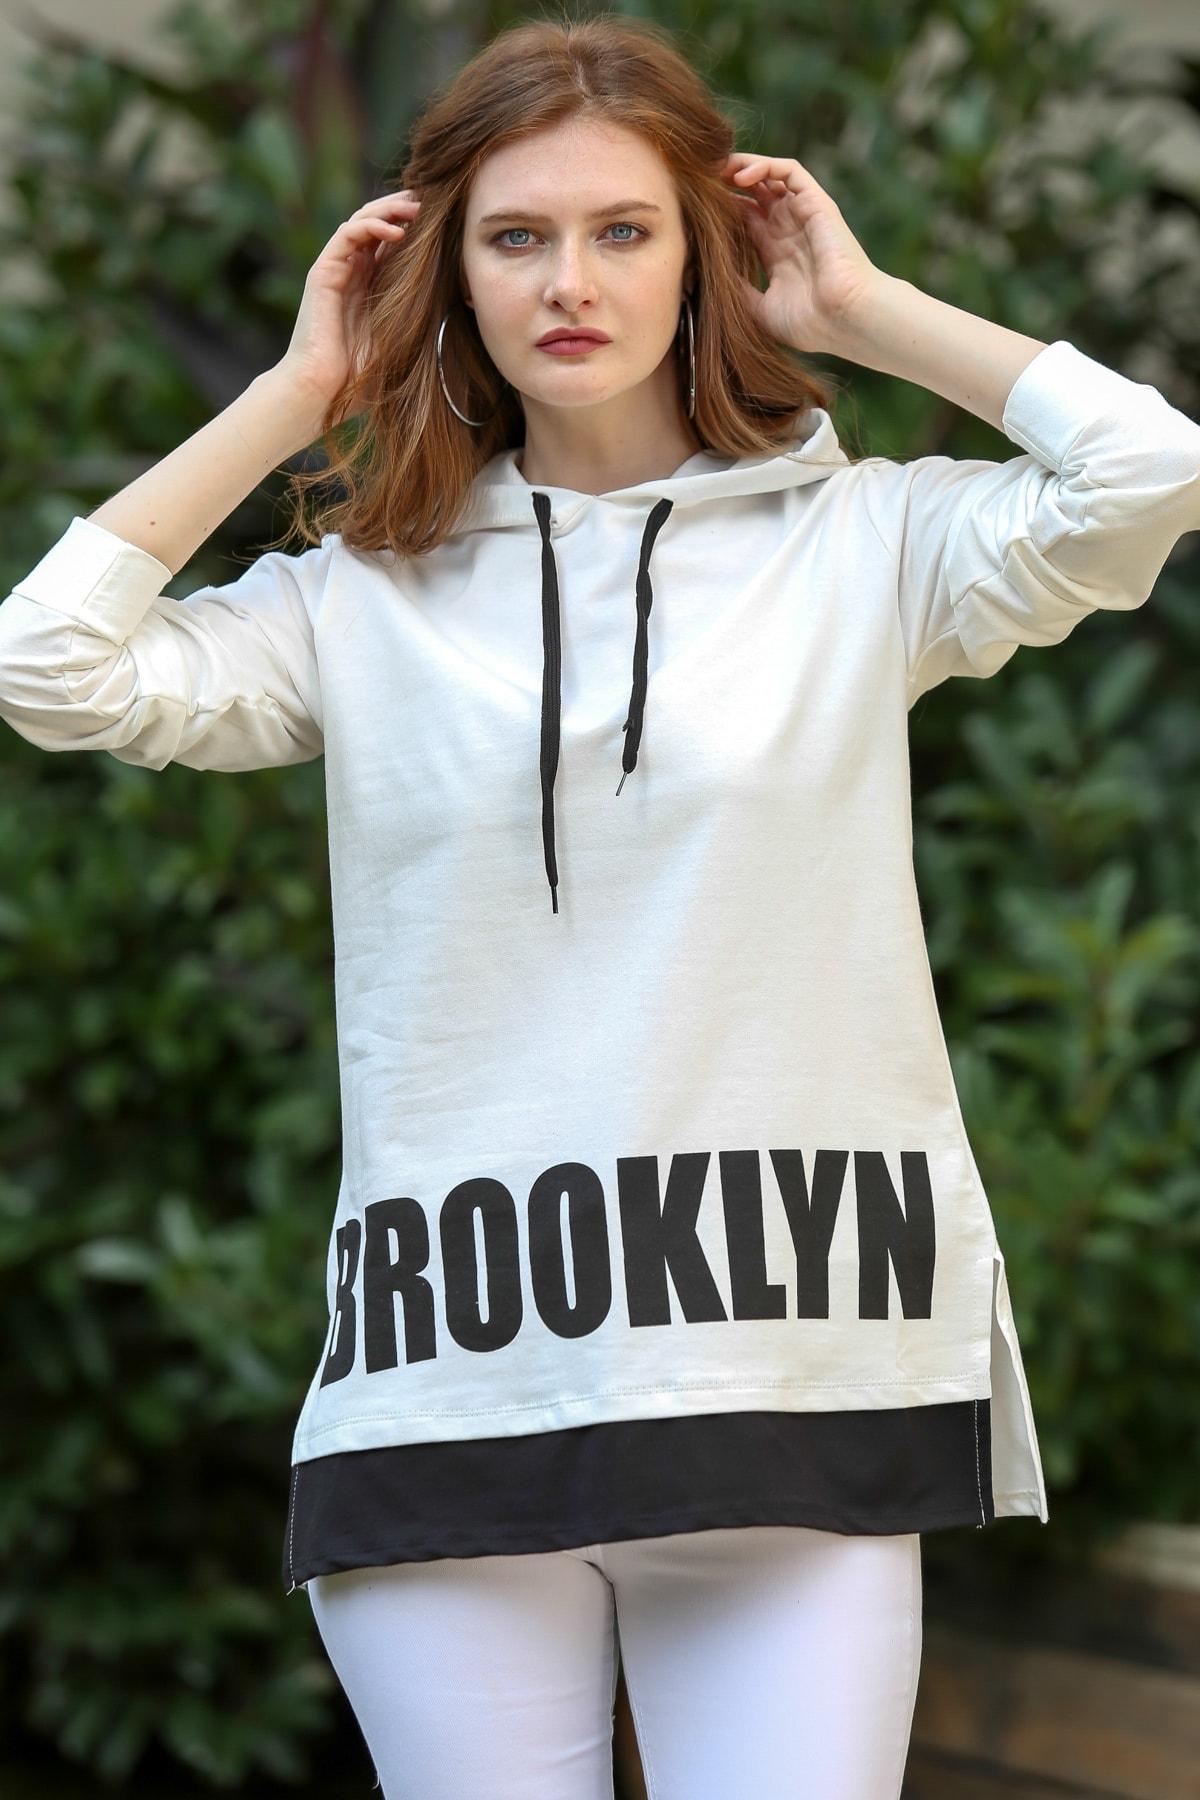 Chiccy Kadın Ekru Vintage Brooklyn Baskılı Kapüşonlu Sweat M10010700SW99340